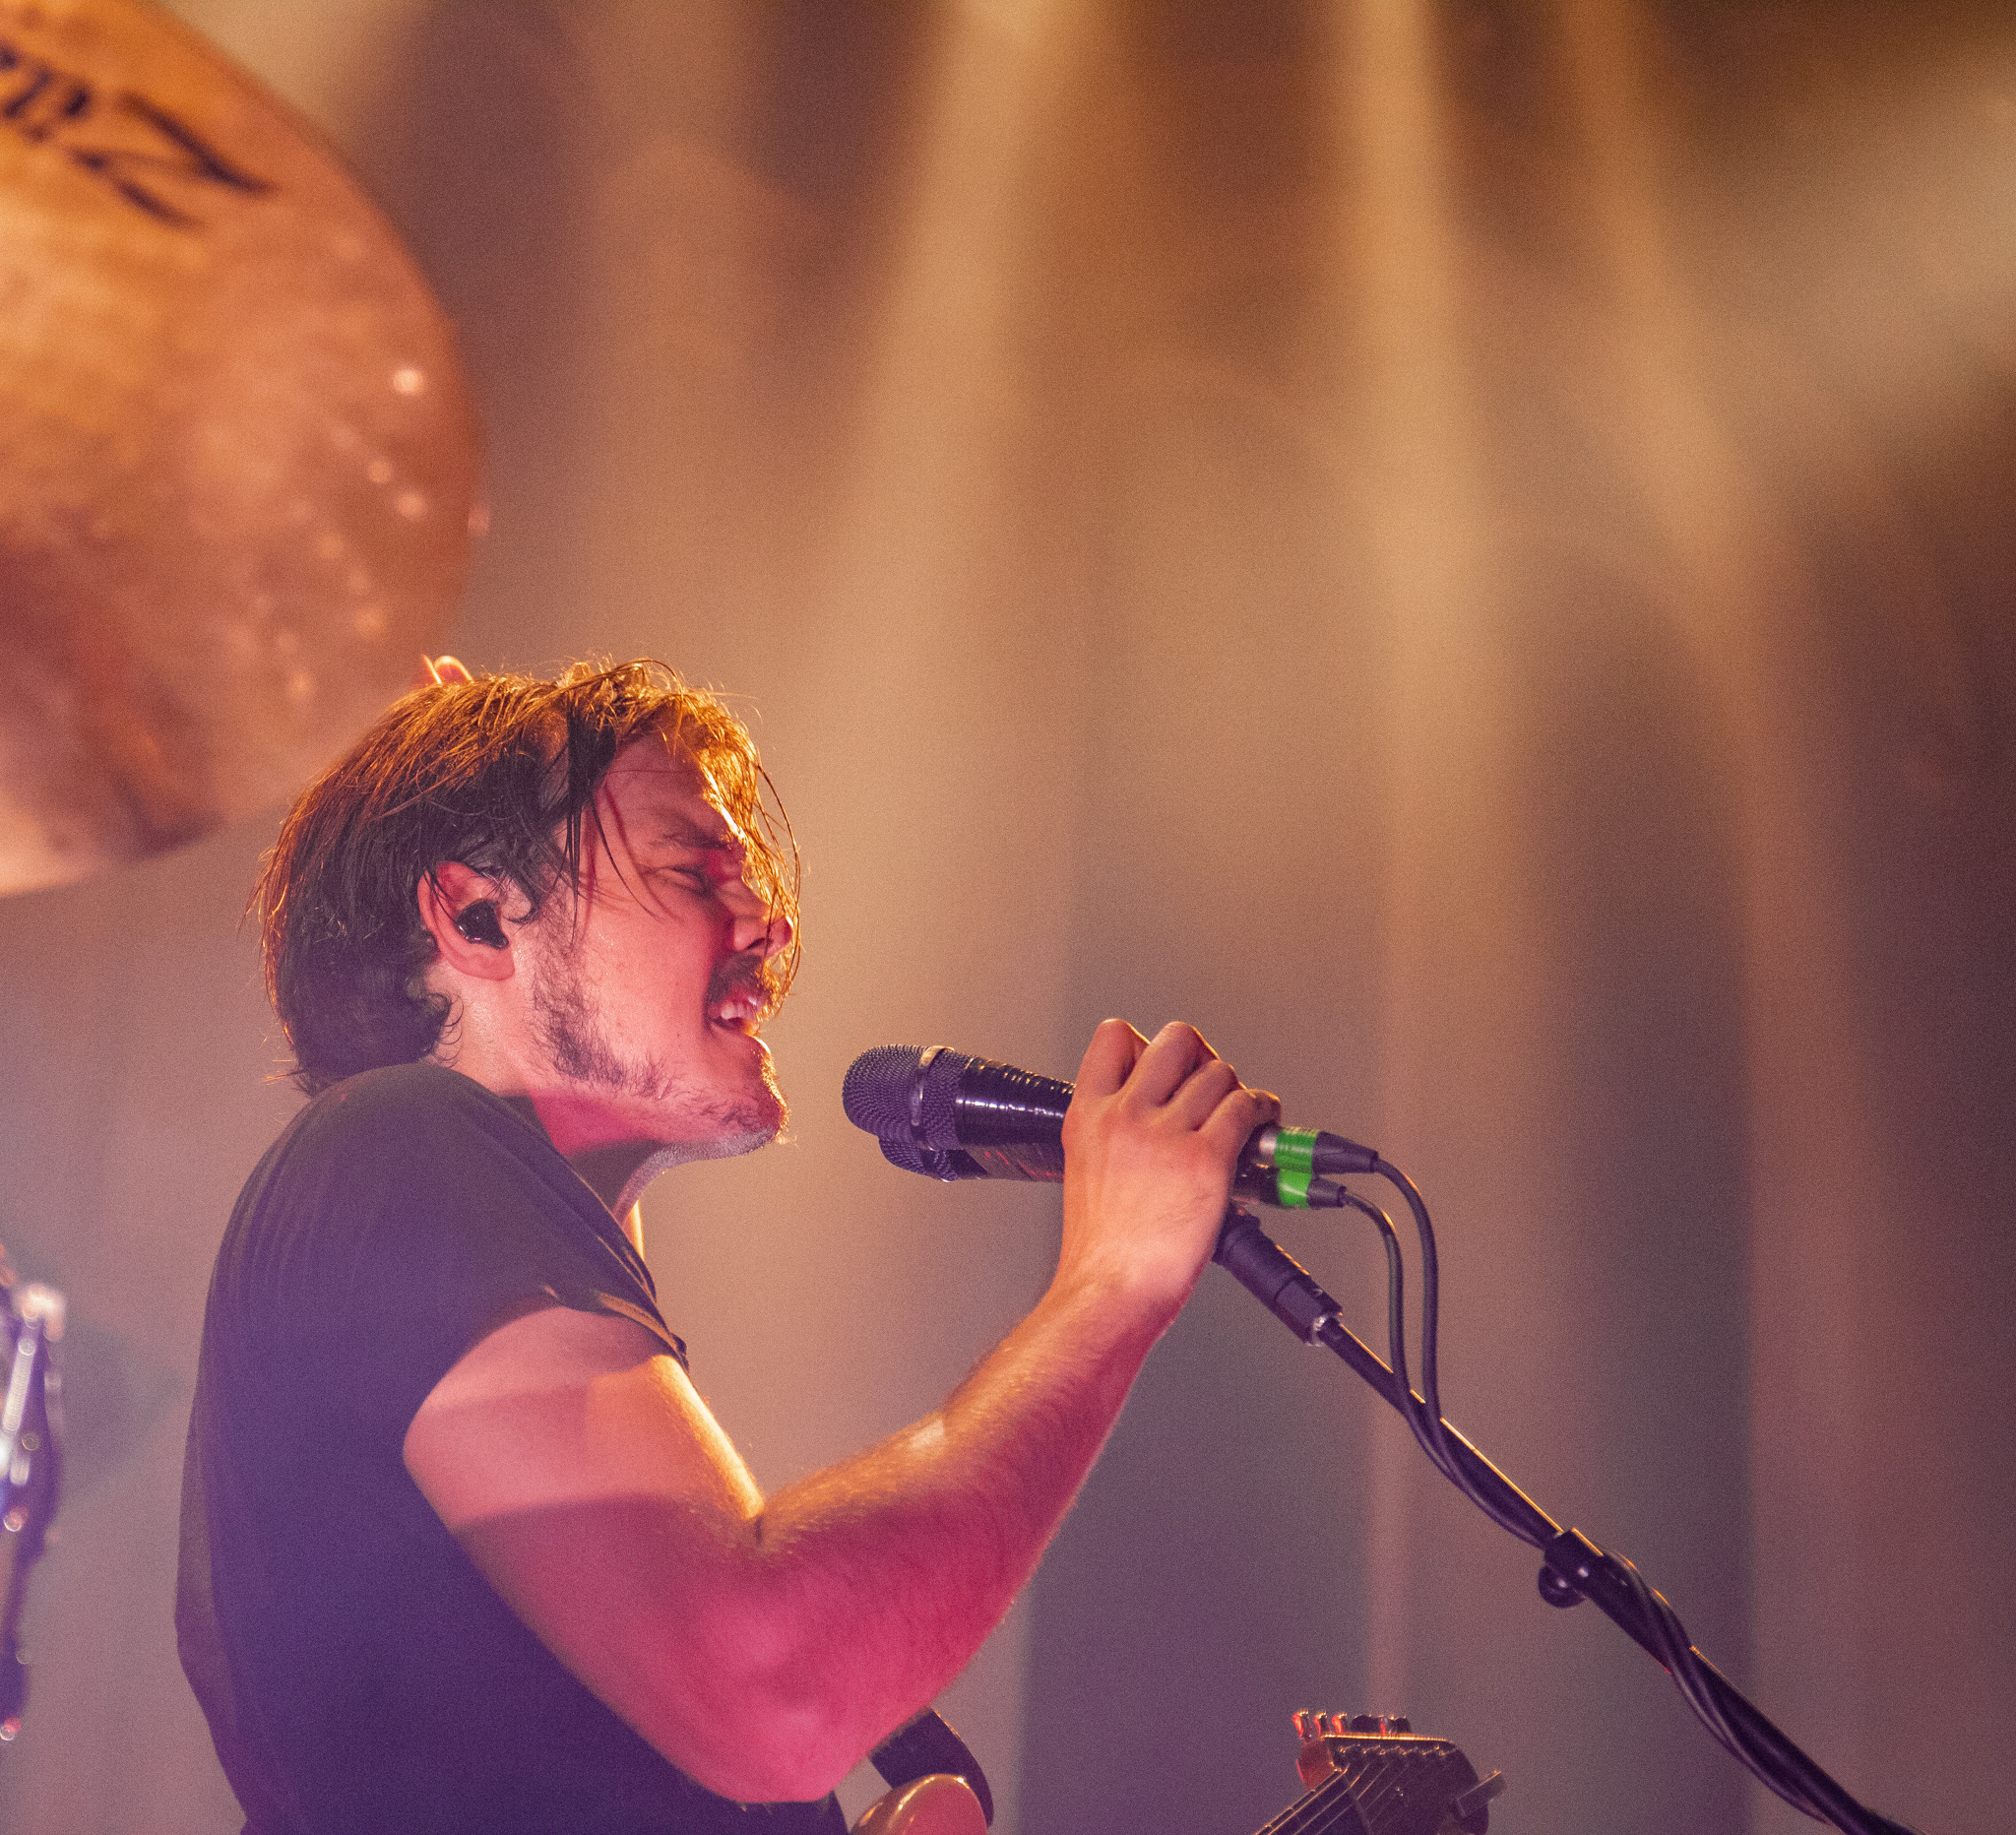 HalfMoonRun-Paradiso-Amsterdam_NL-20191113-SylviaWijnands-015